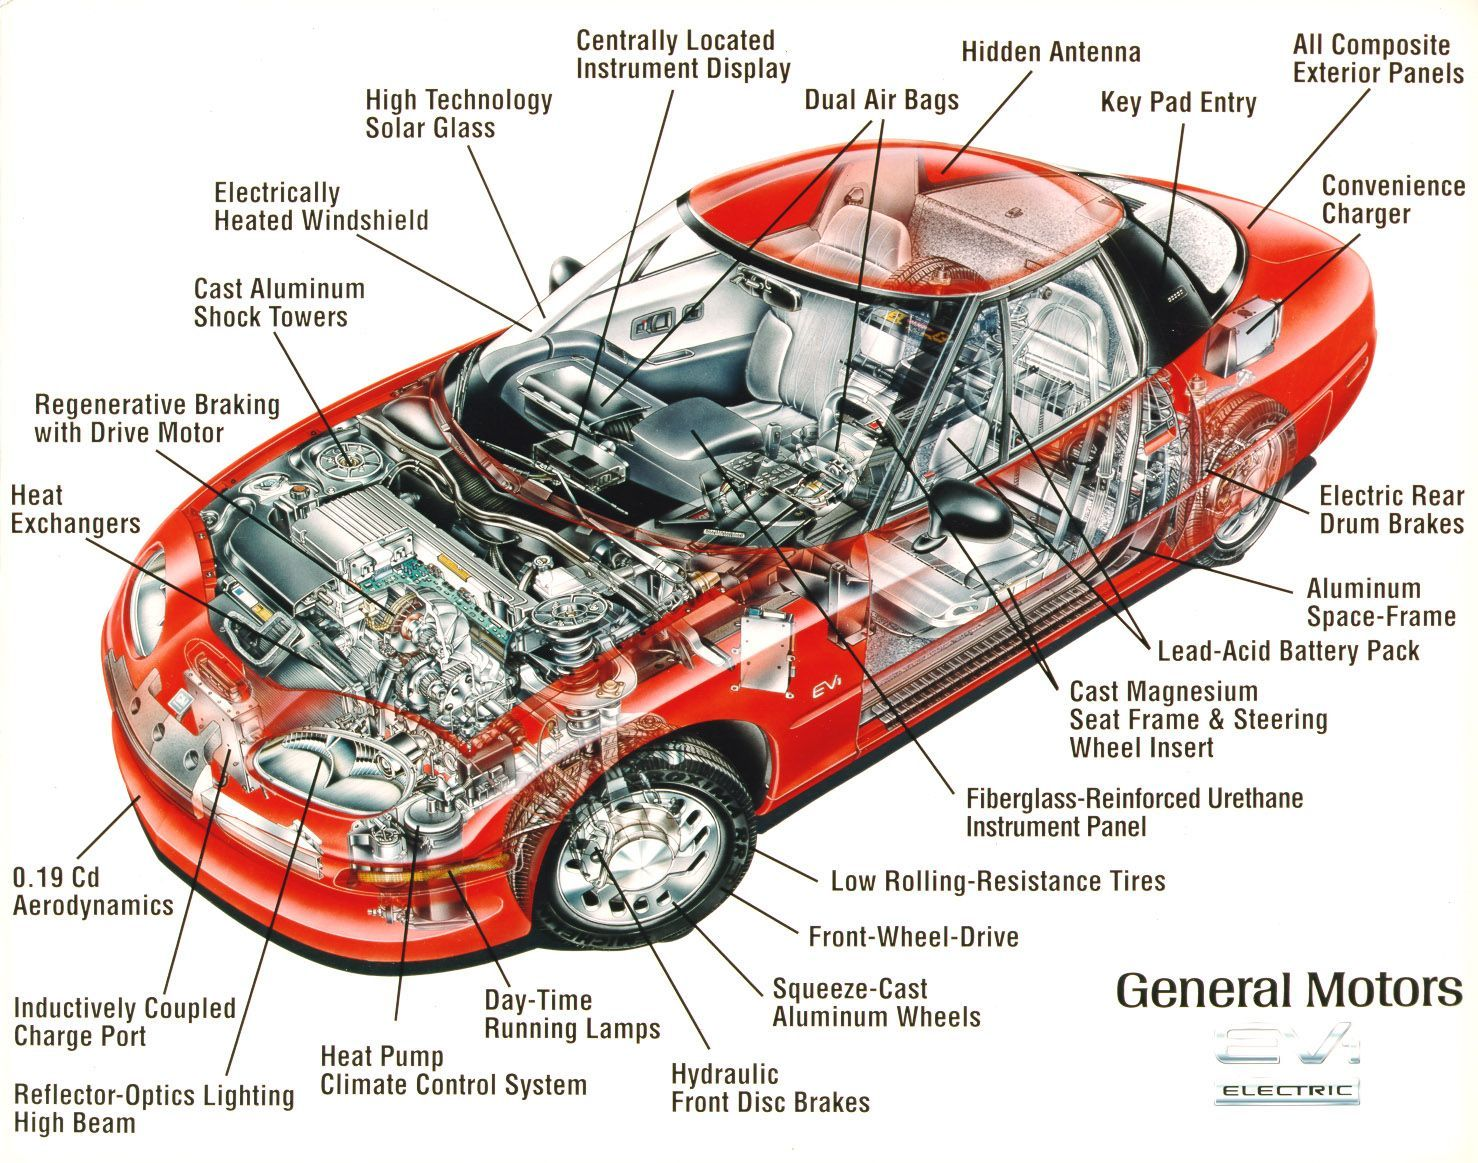 hight resolution of basic car diagram wiring diagram source car interior dashboard diagram basic car engine parts diagram general